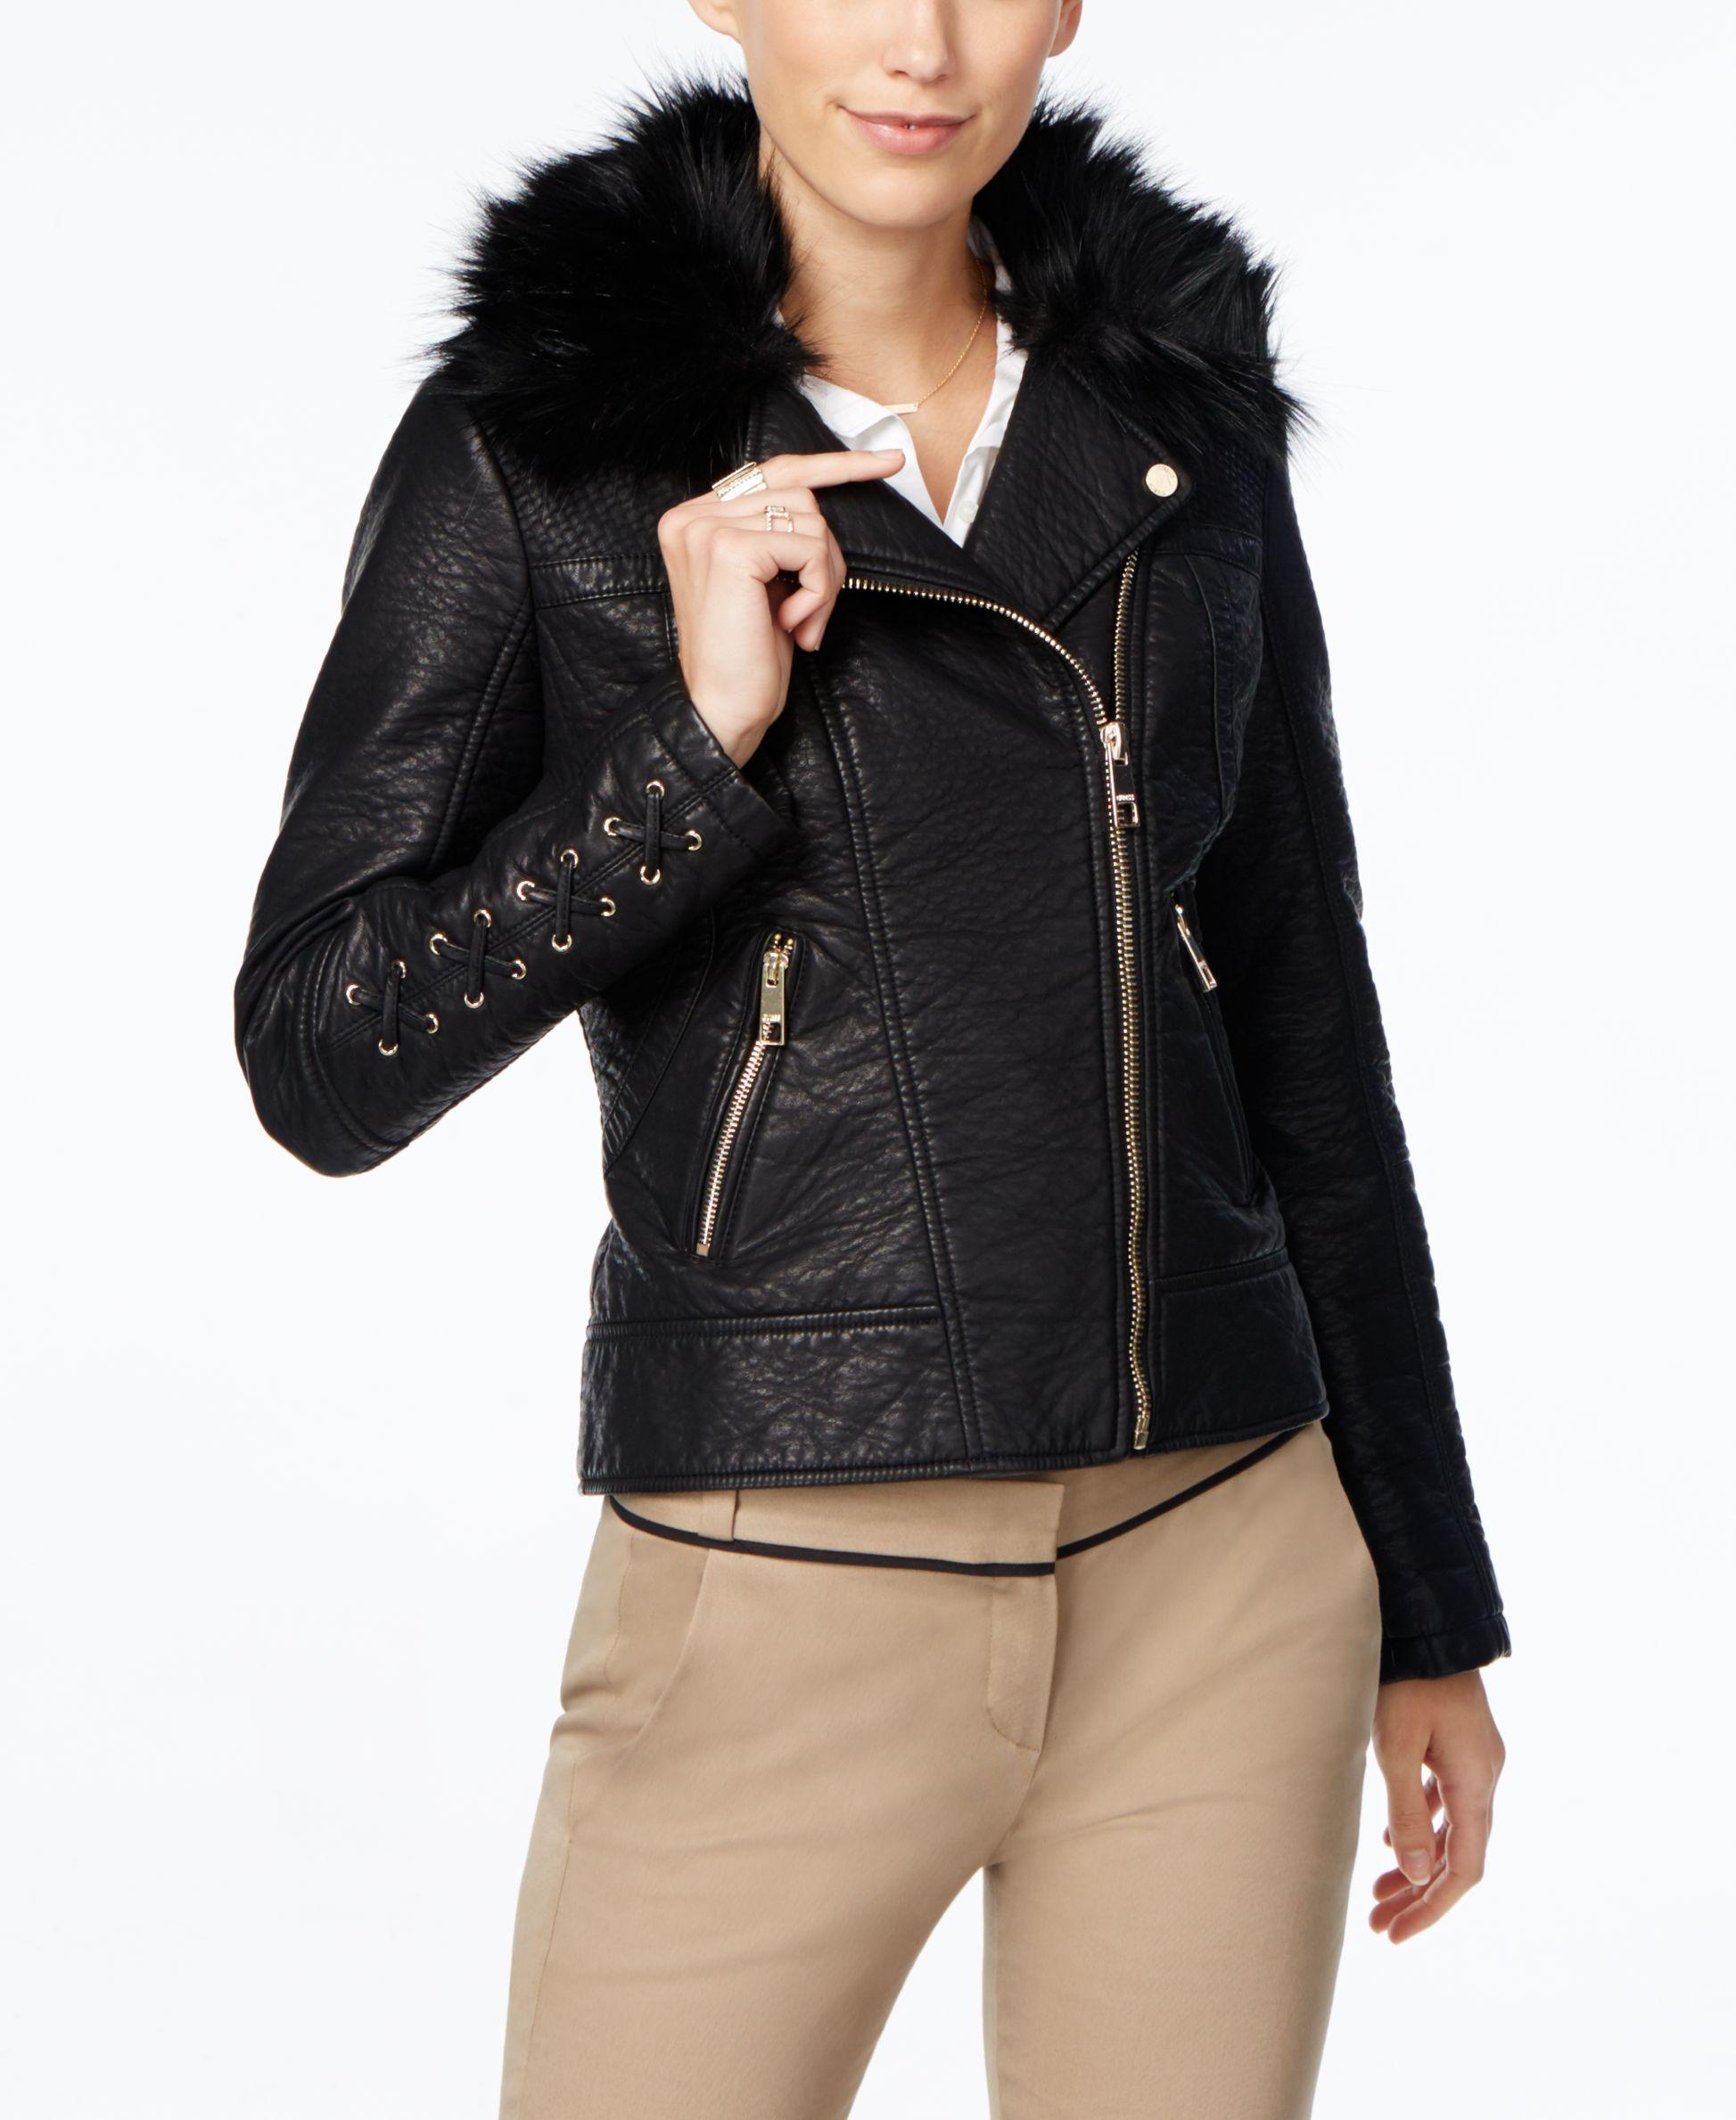 Guess Faux Fur Collar Faux Leather Moto Jacket Coats Women Macy S Faux Leather Moto Jacket Fur Leather Jacket Faux Fur Collar [ 2378 x 1947 Pixel ]